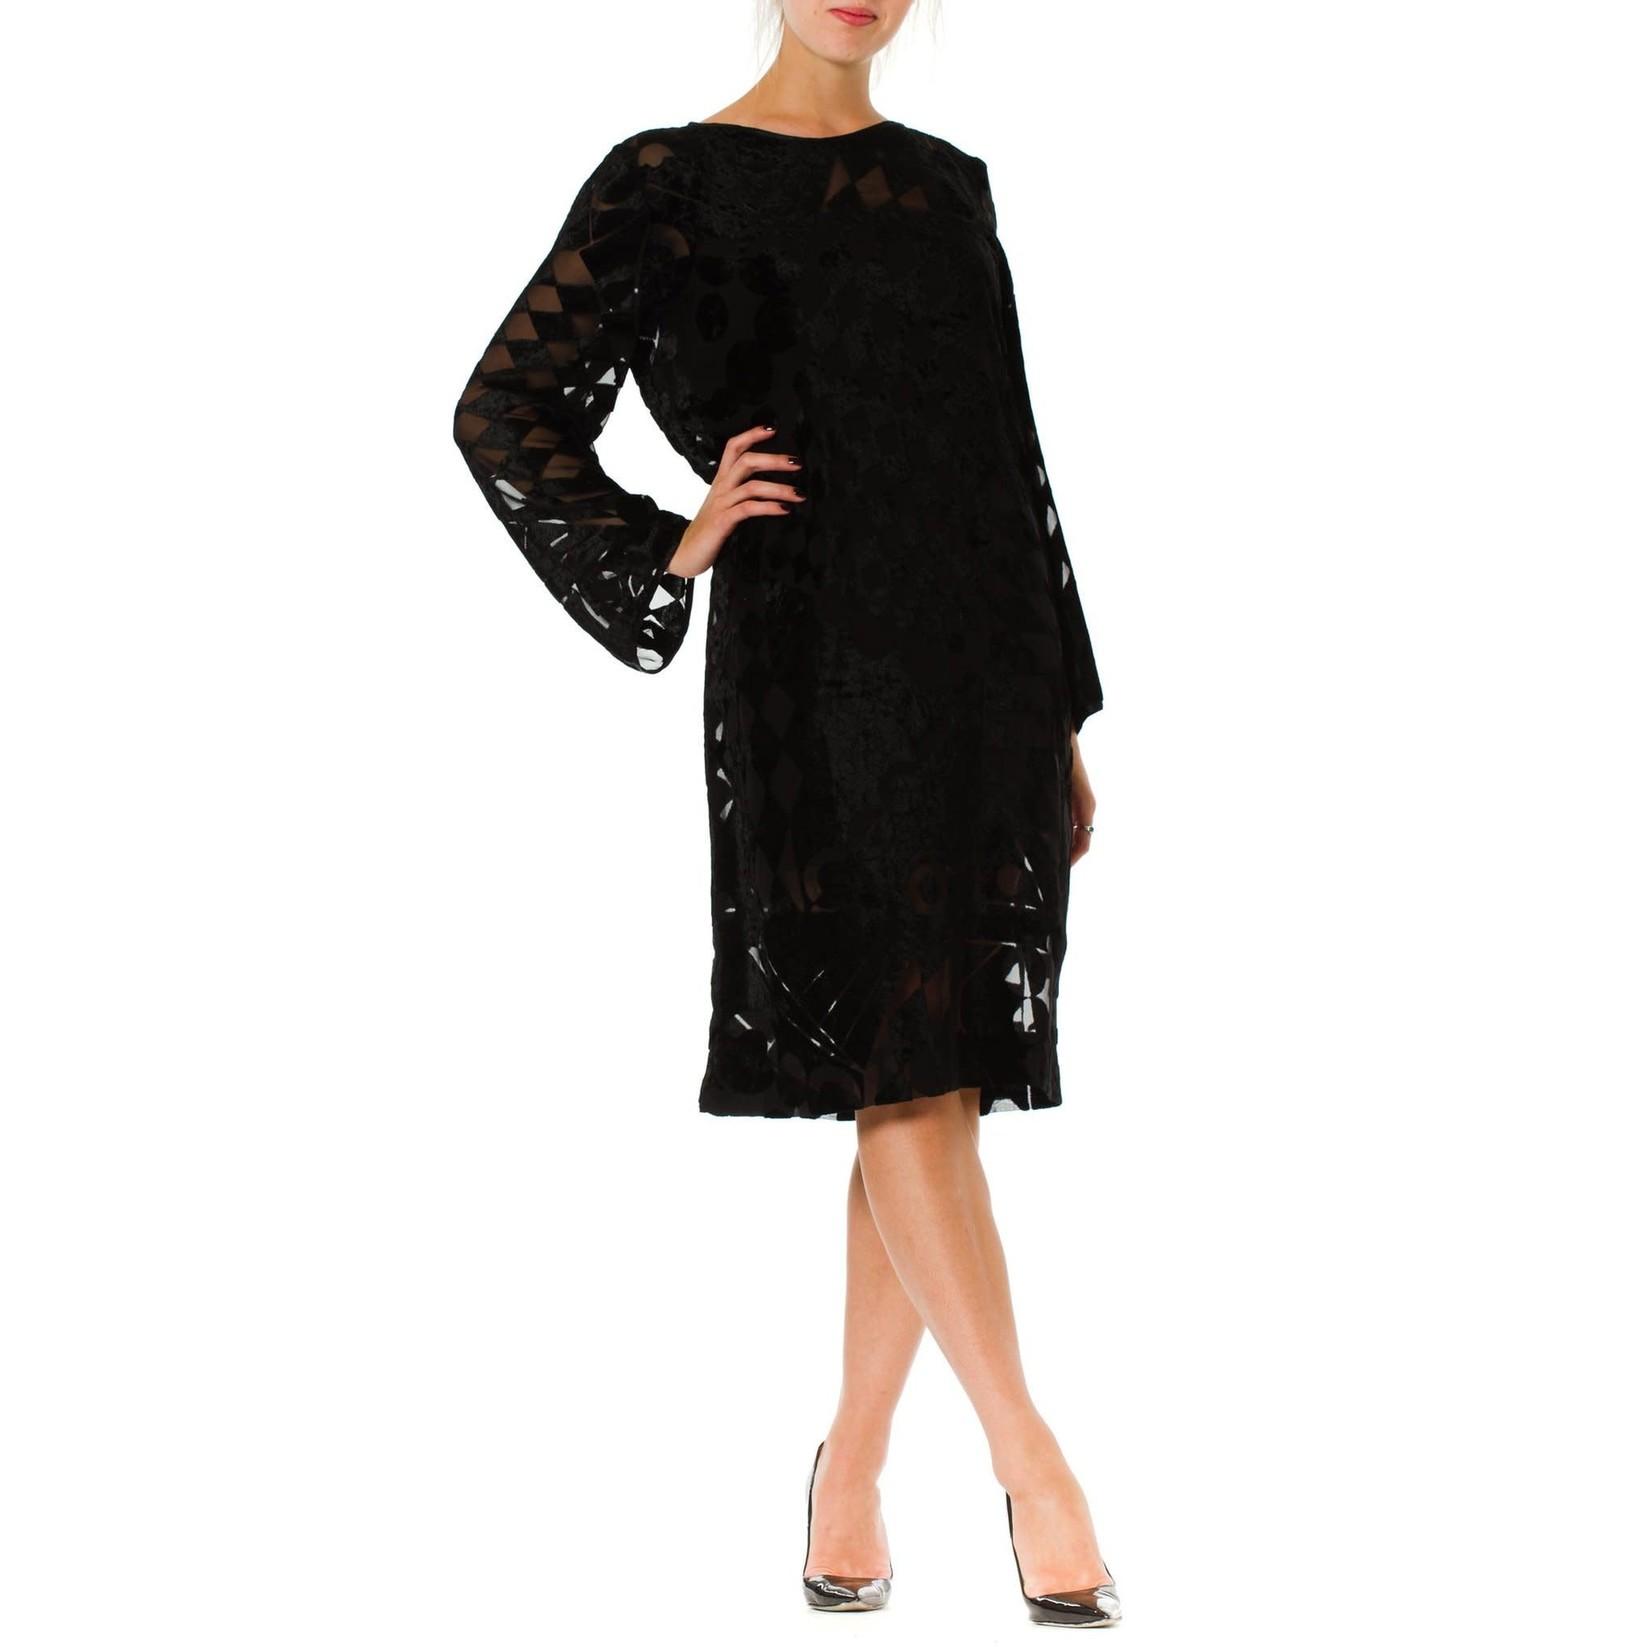 Wyld Blue Vintage 1980s Black Silk Burnout Chiffon Geometric Long Sleeve Tunic Cocktail Dress